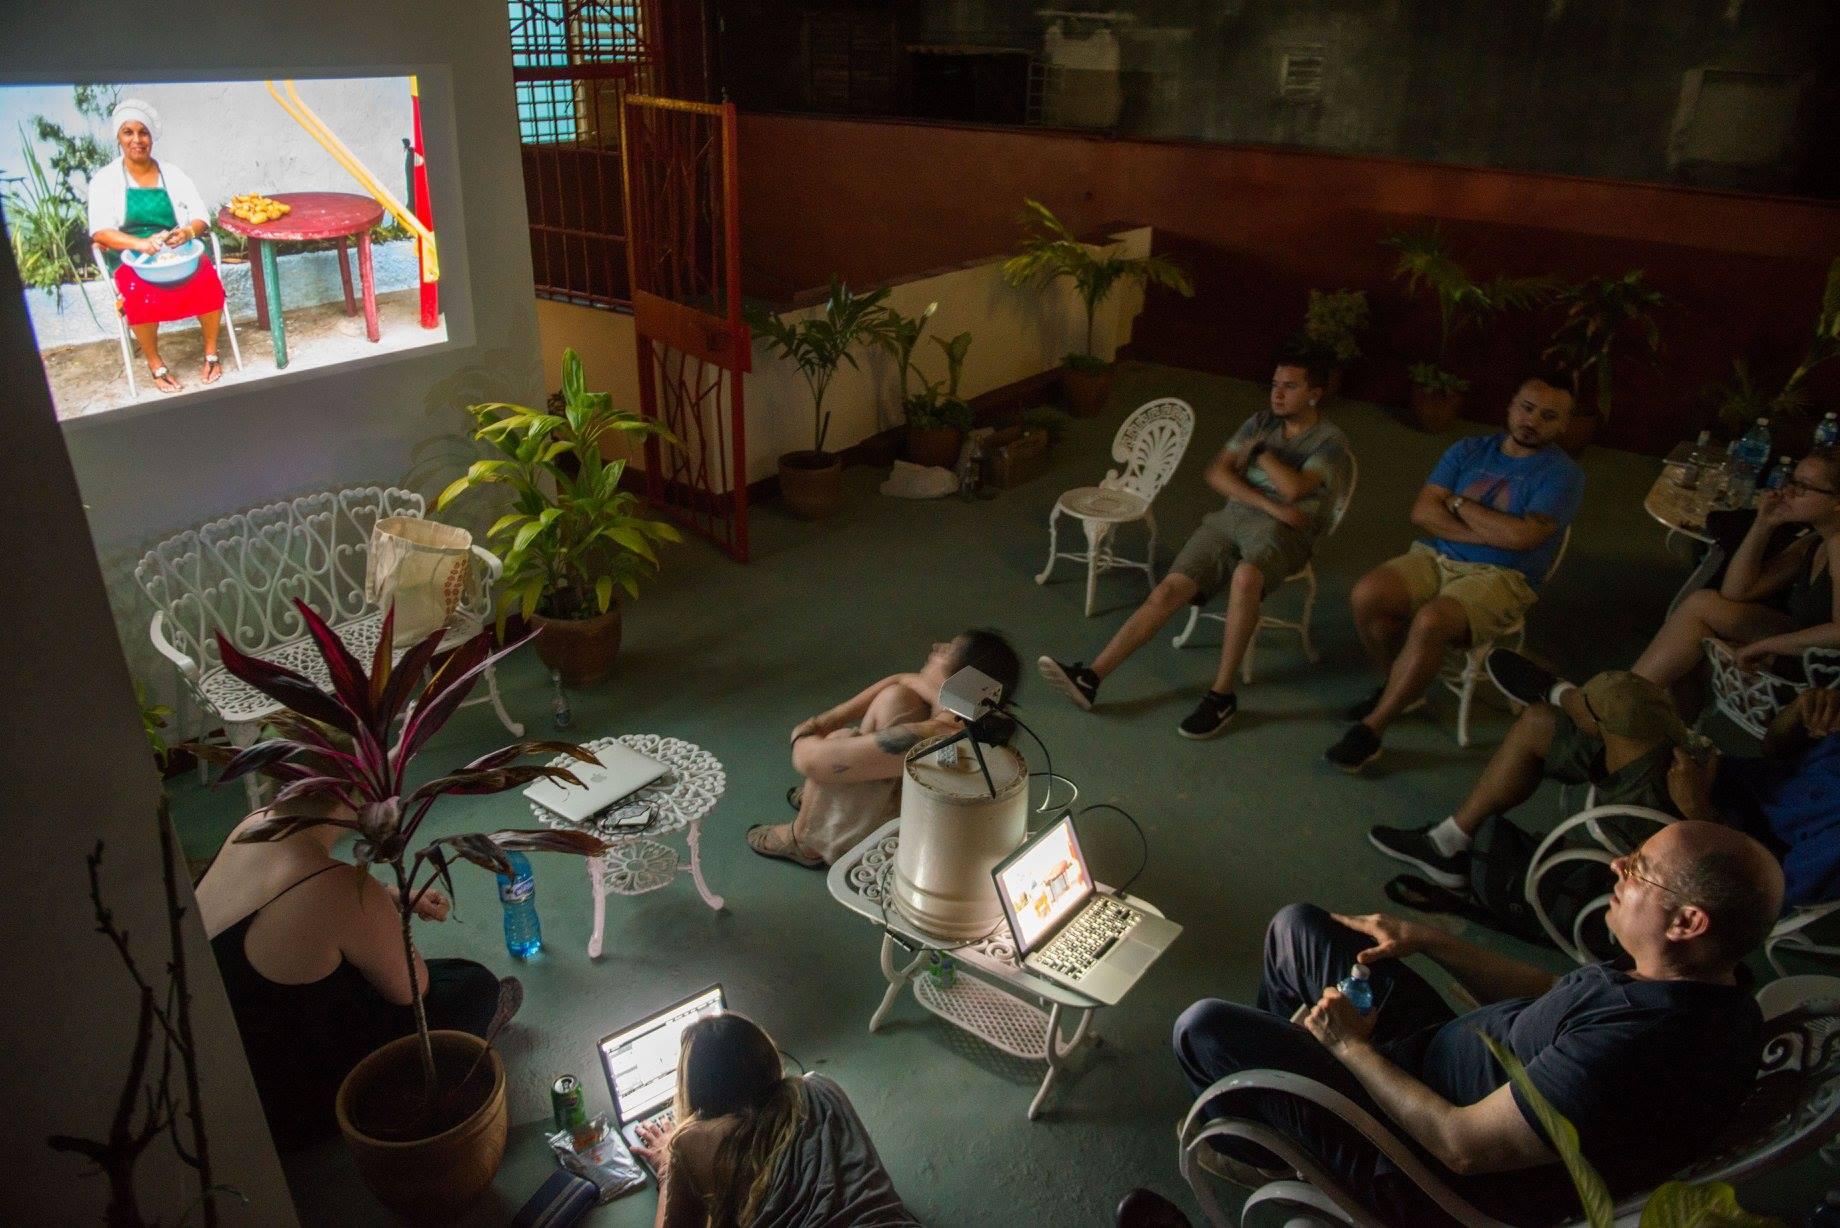 Cuba Tour slideshow